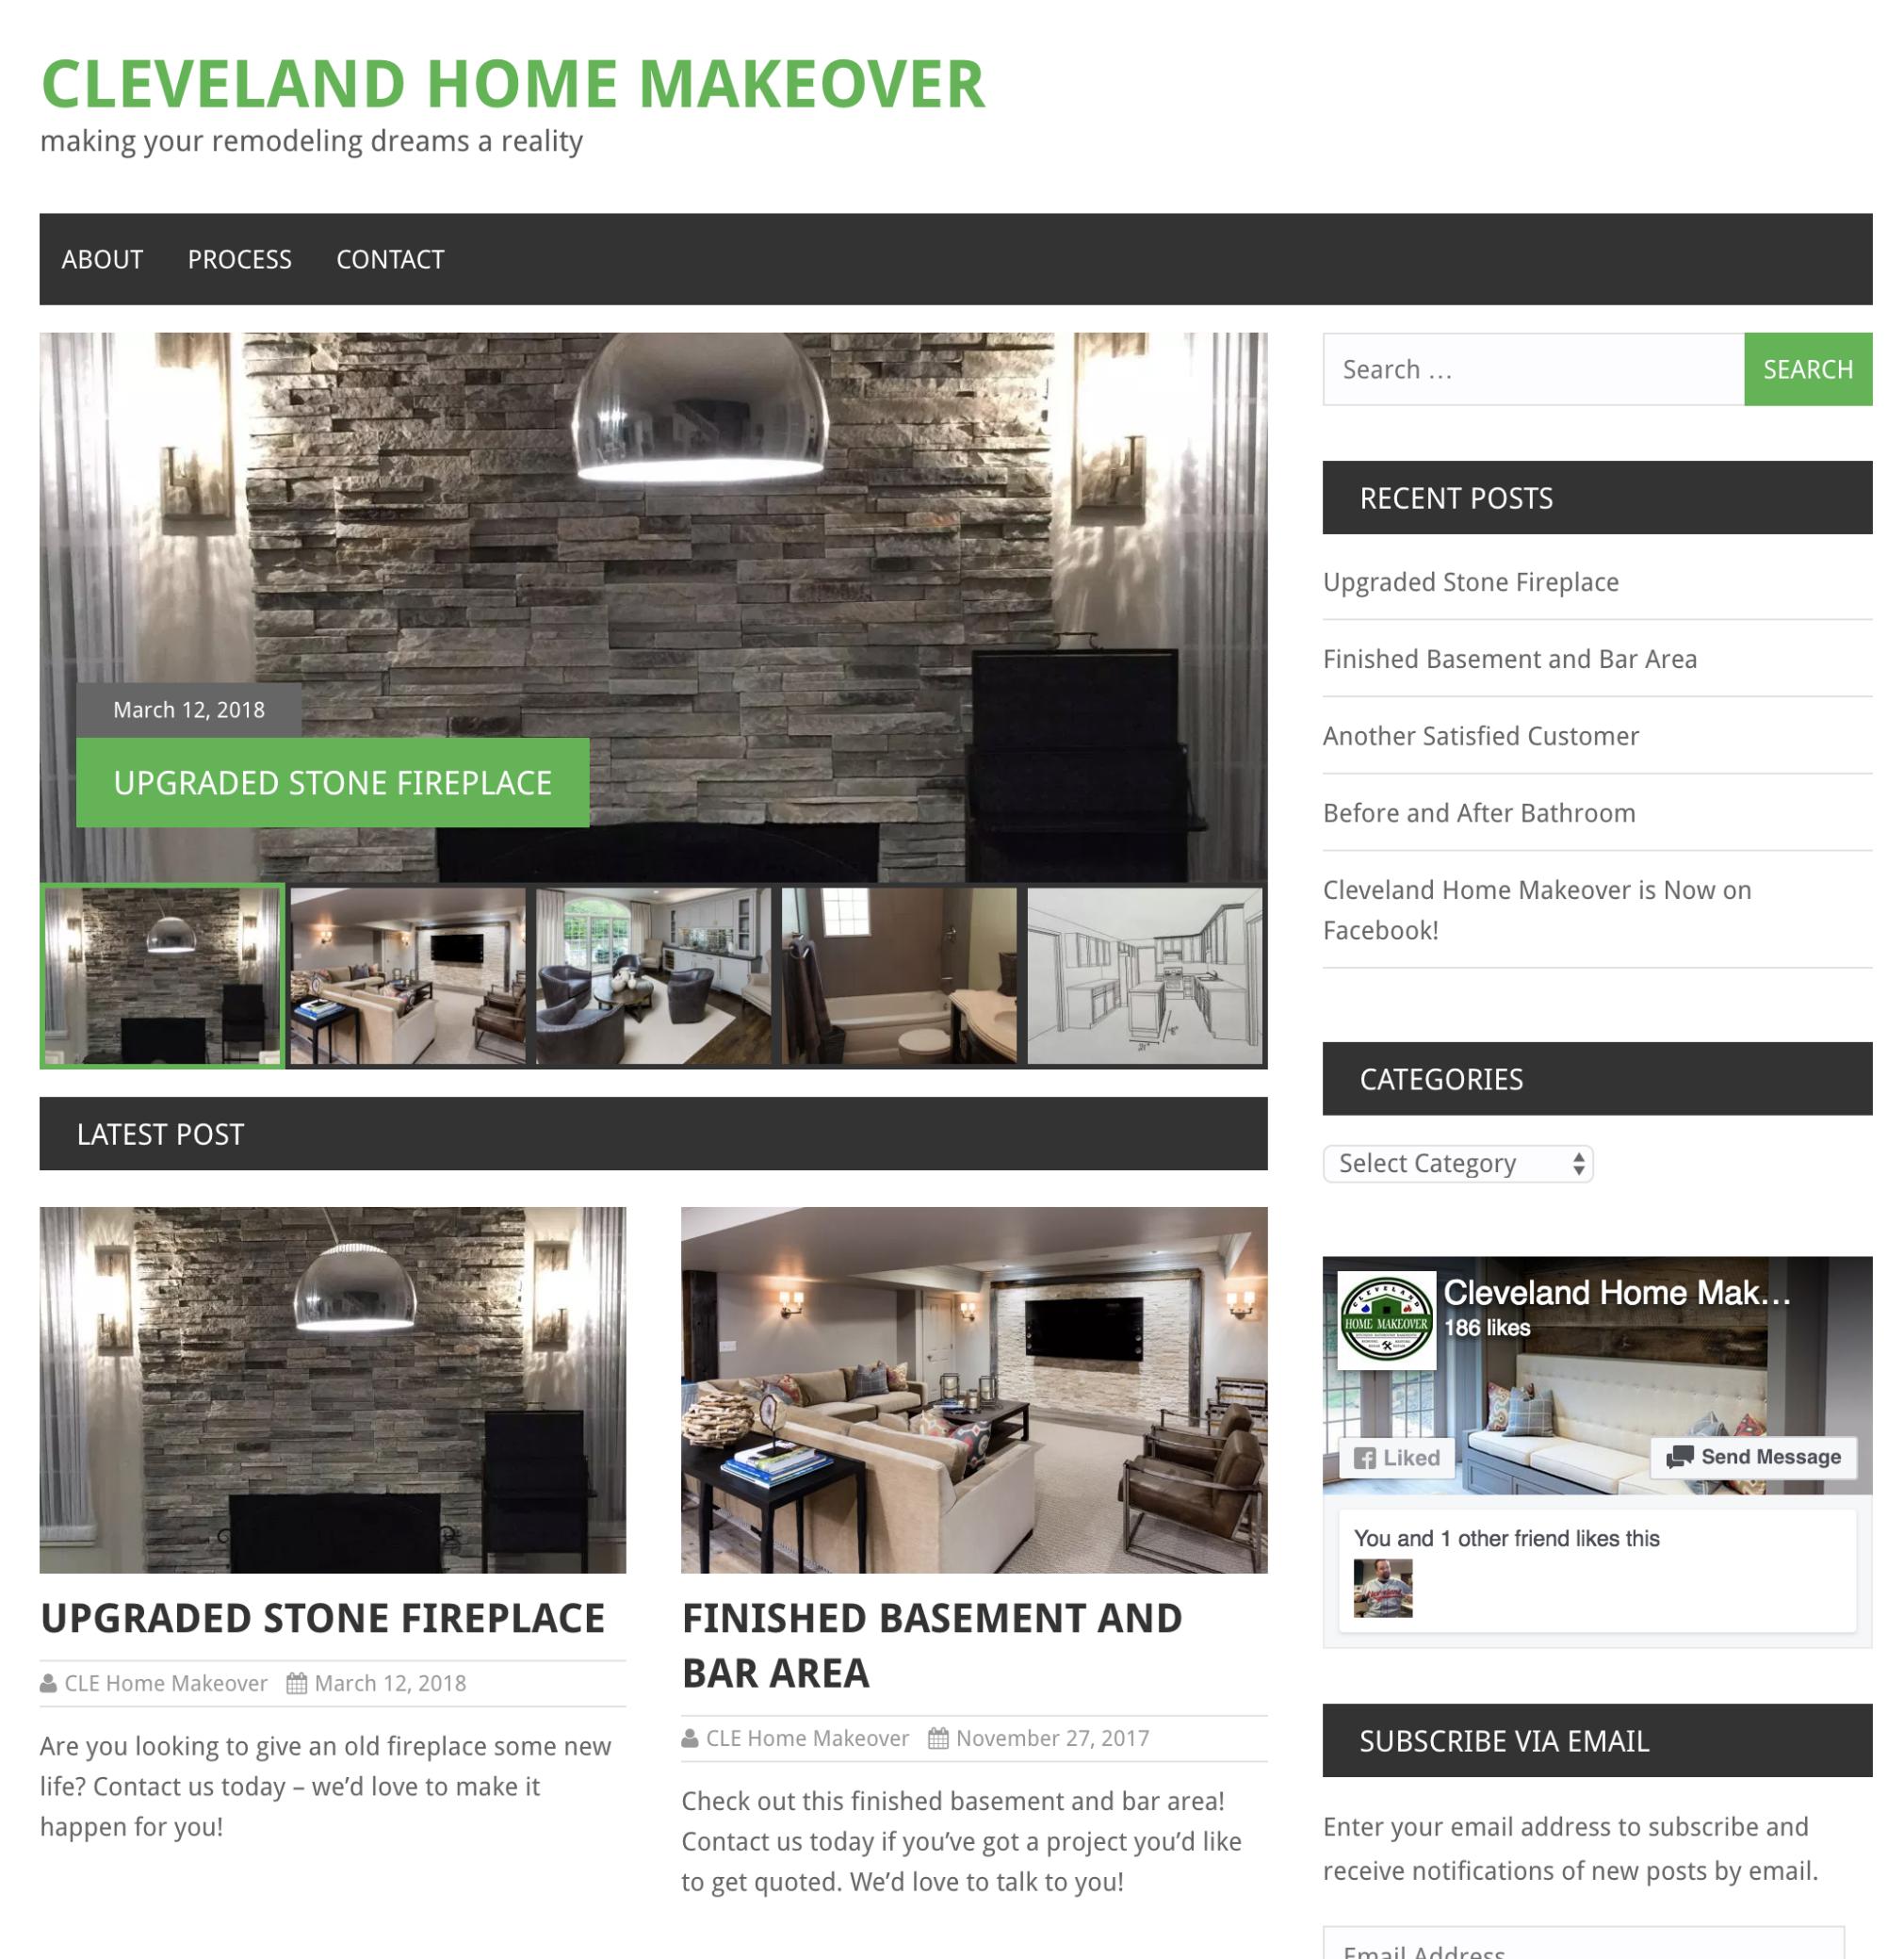 Cleveland Home Makeover